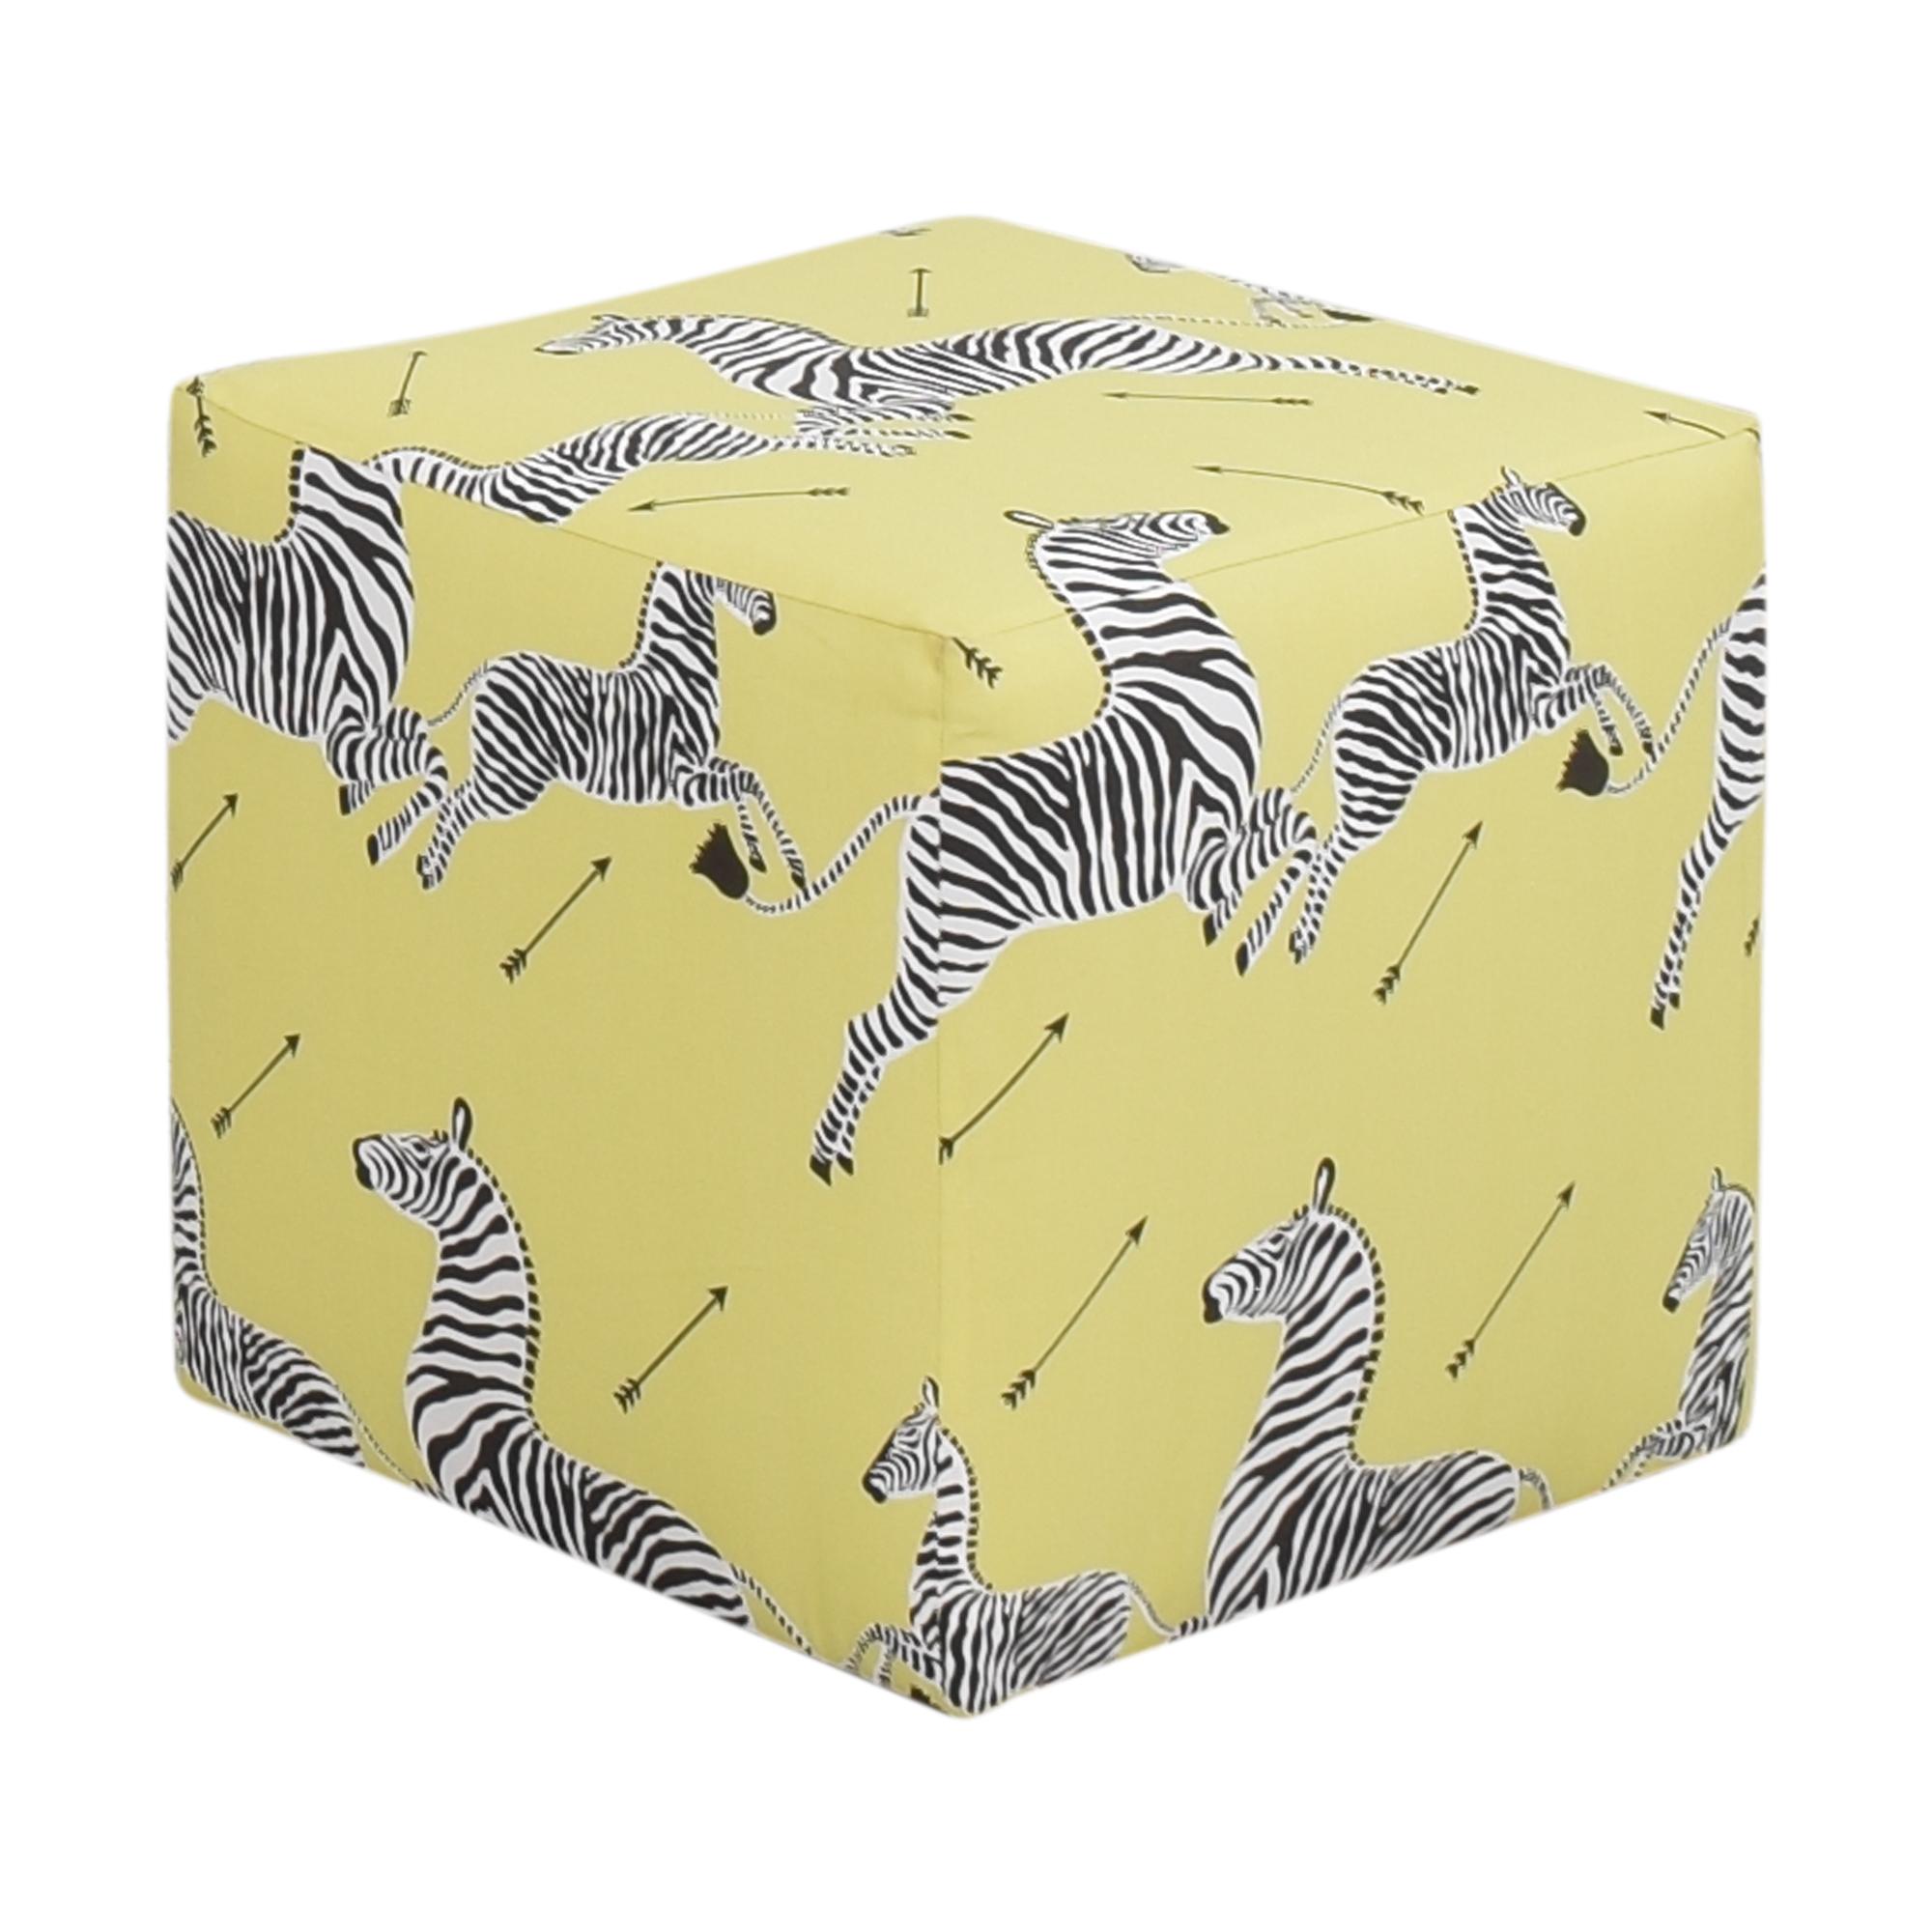 The Inside Zebra Cube Ottoman / Chairs